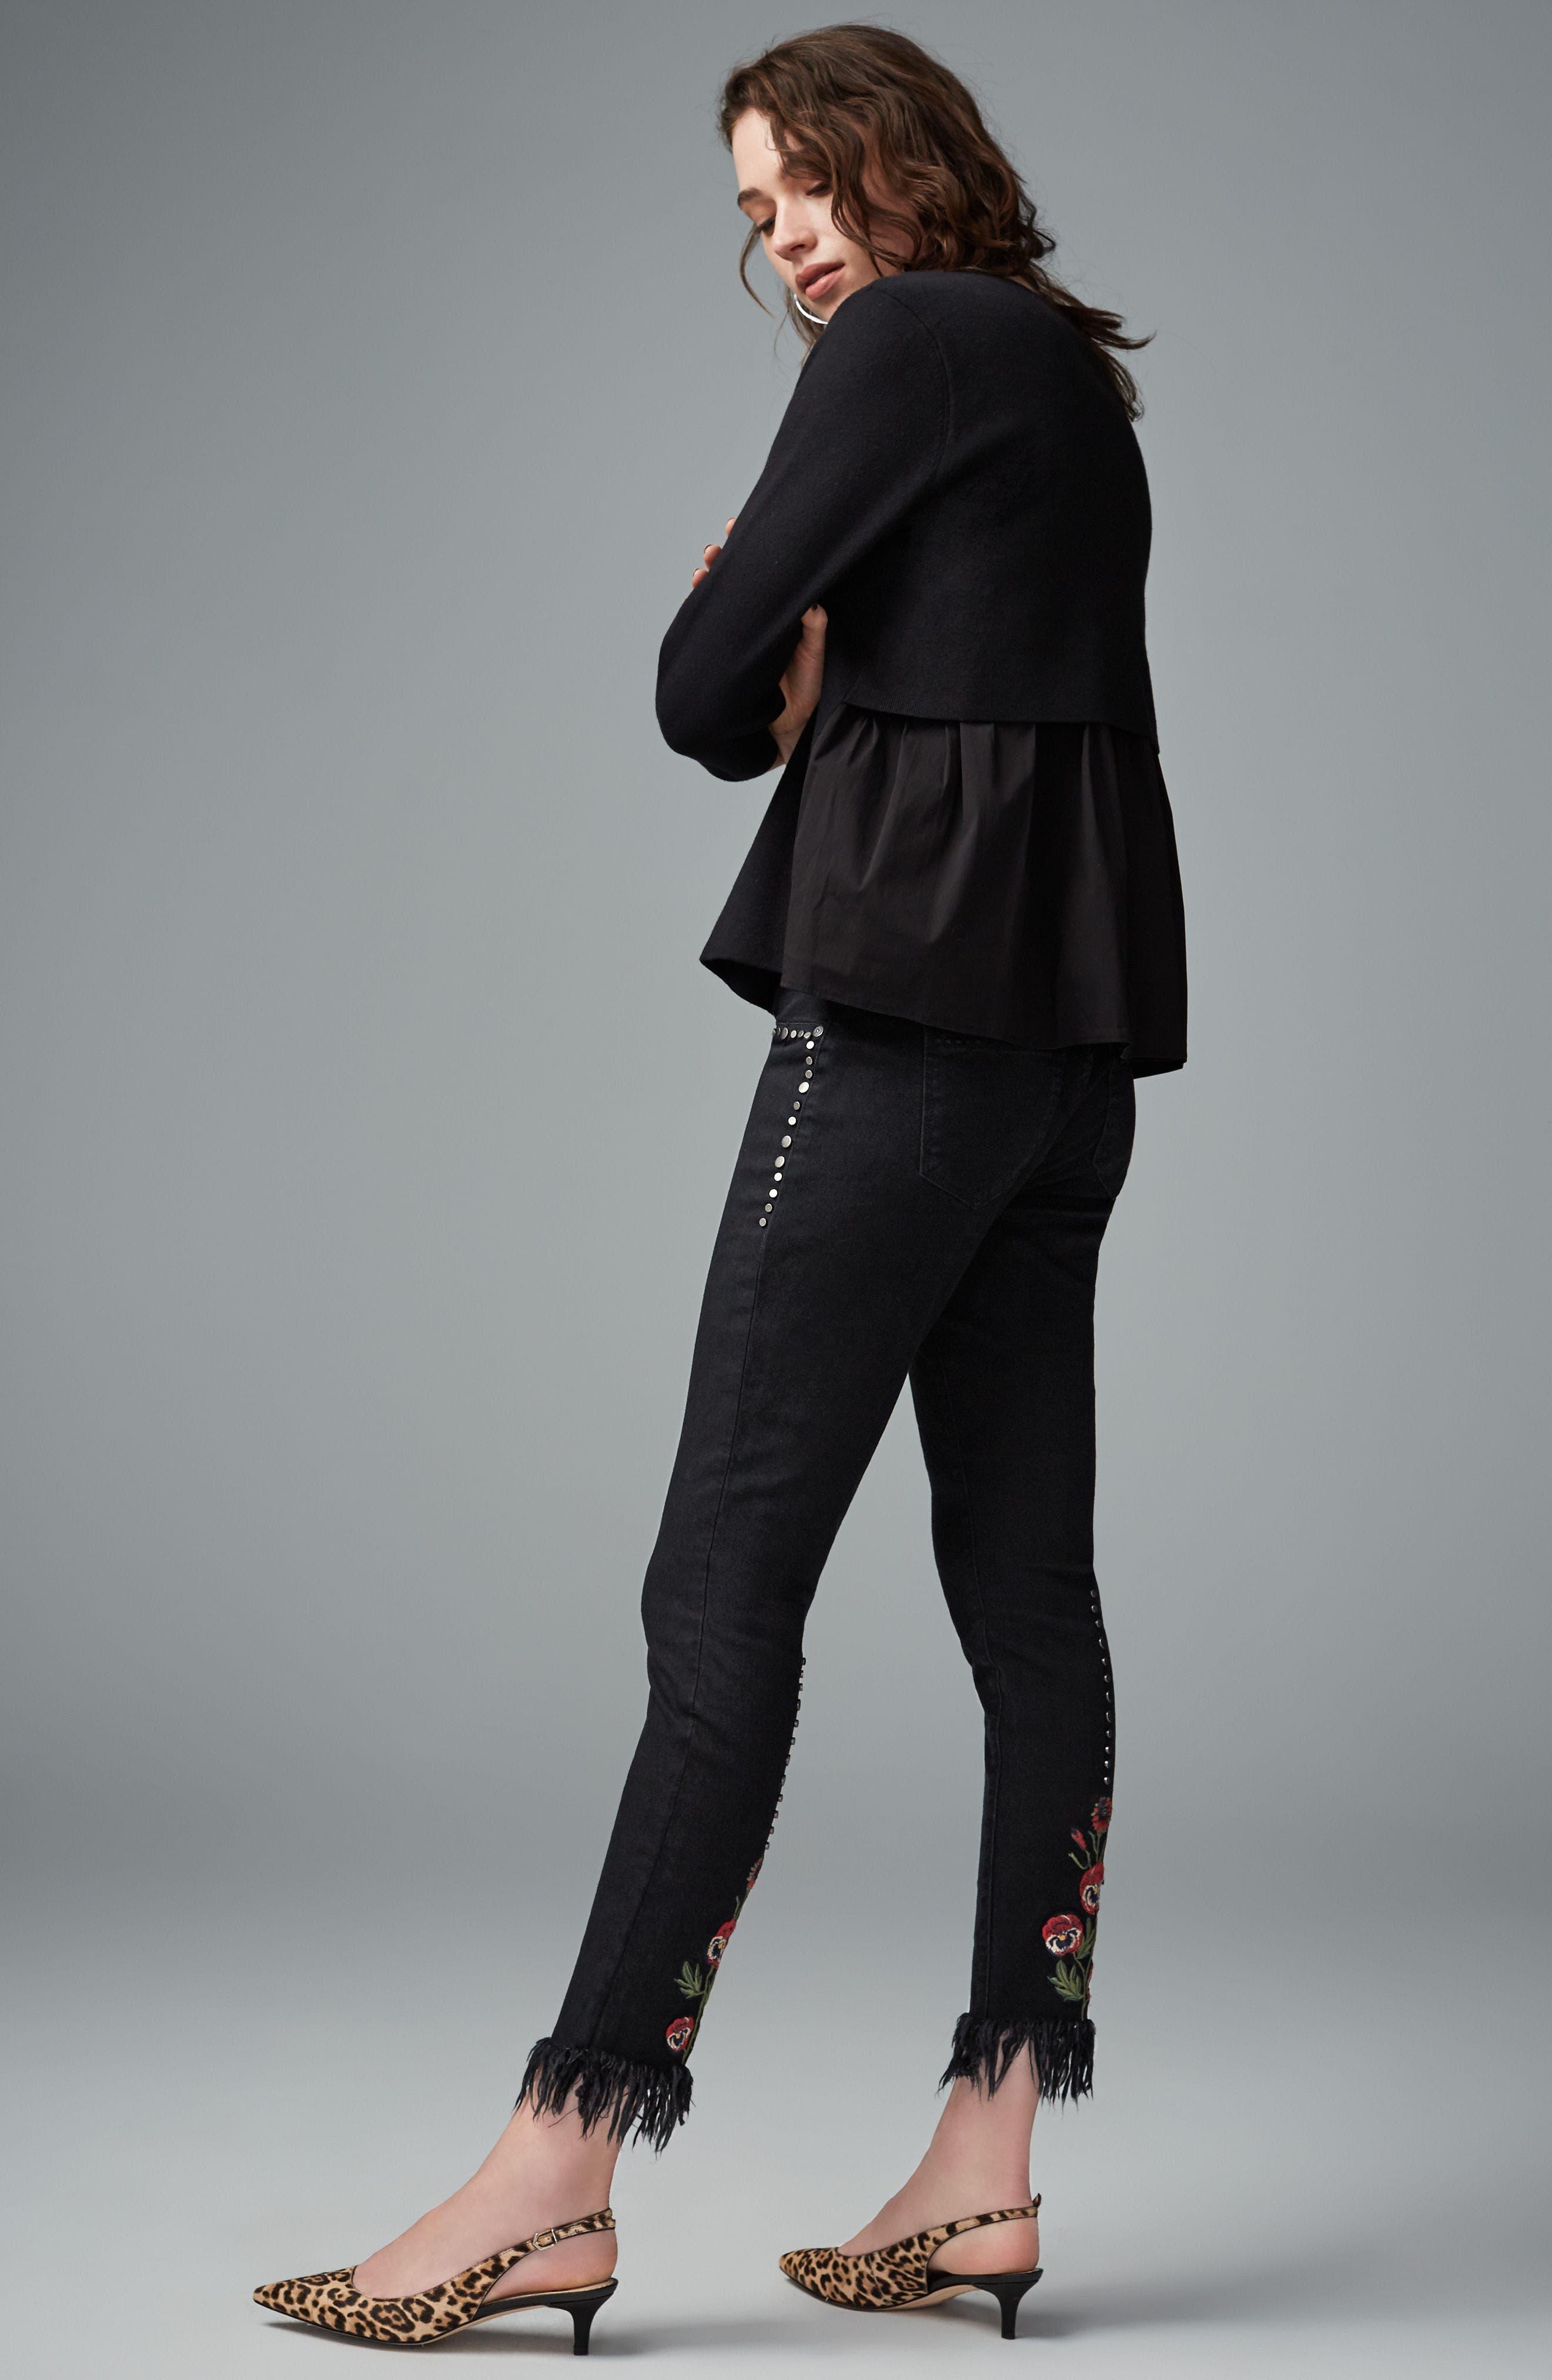 Embroidered & Studded Skinny Jeans,                             Alternate thumbnail 2, color,                             Hidden Talent Black